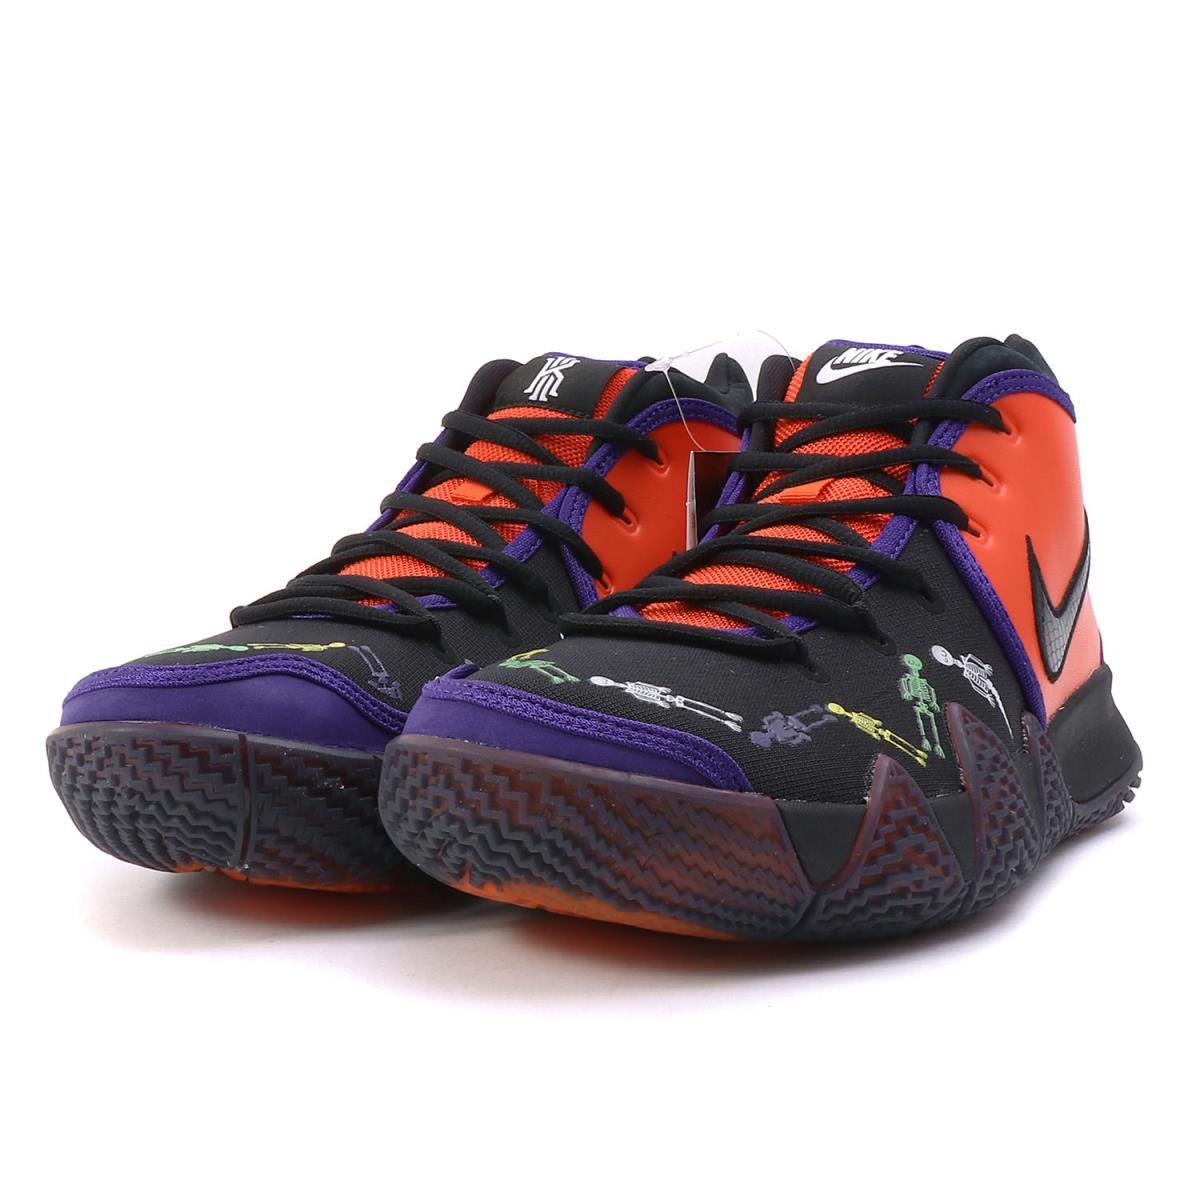 finest selection 2c8d4 36ef4 NIKE (Nike) KYRIE 4 DOTD TV PE 1 DAY OF THE DEAD (CI0278-800) team orange X  black US9(27cm)